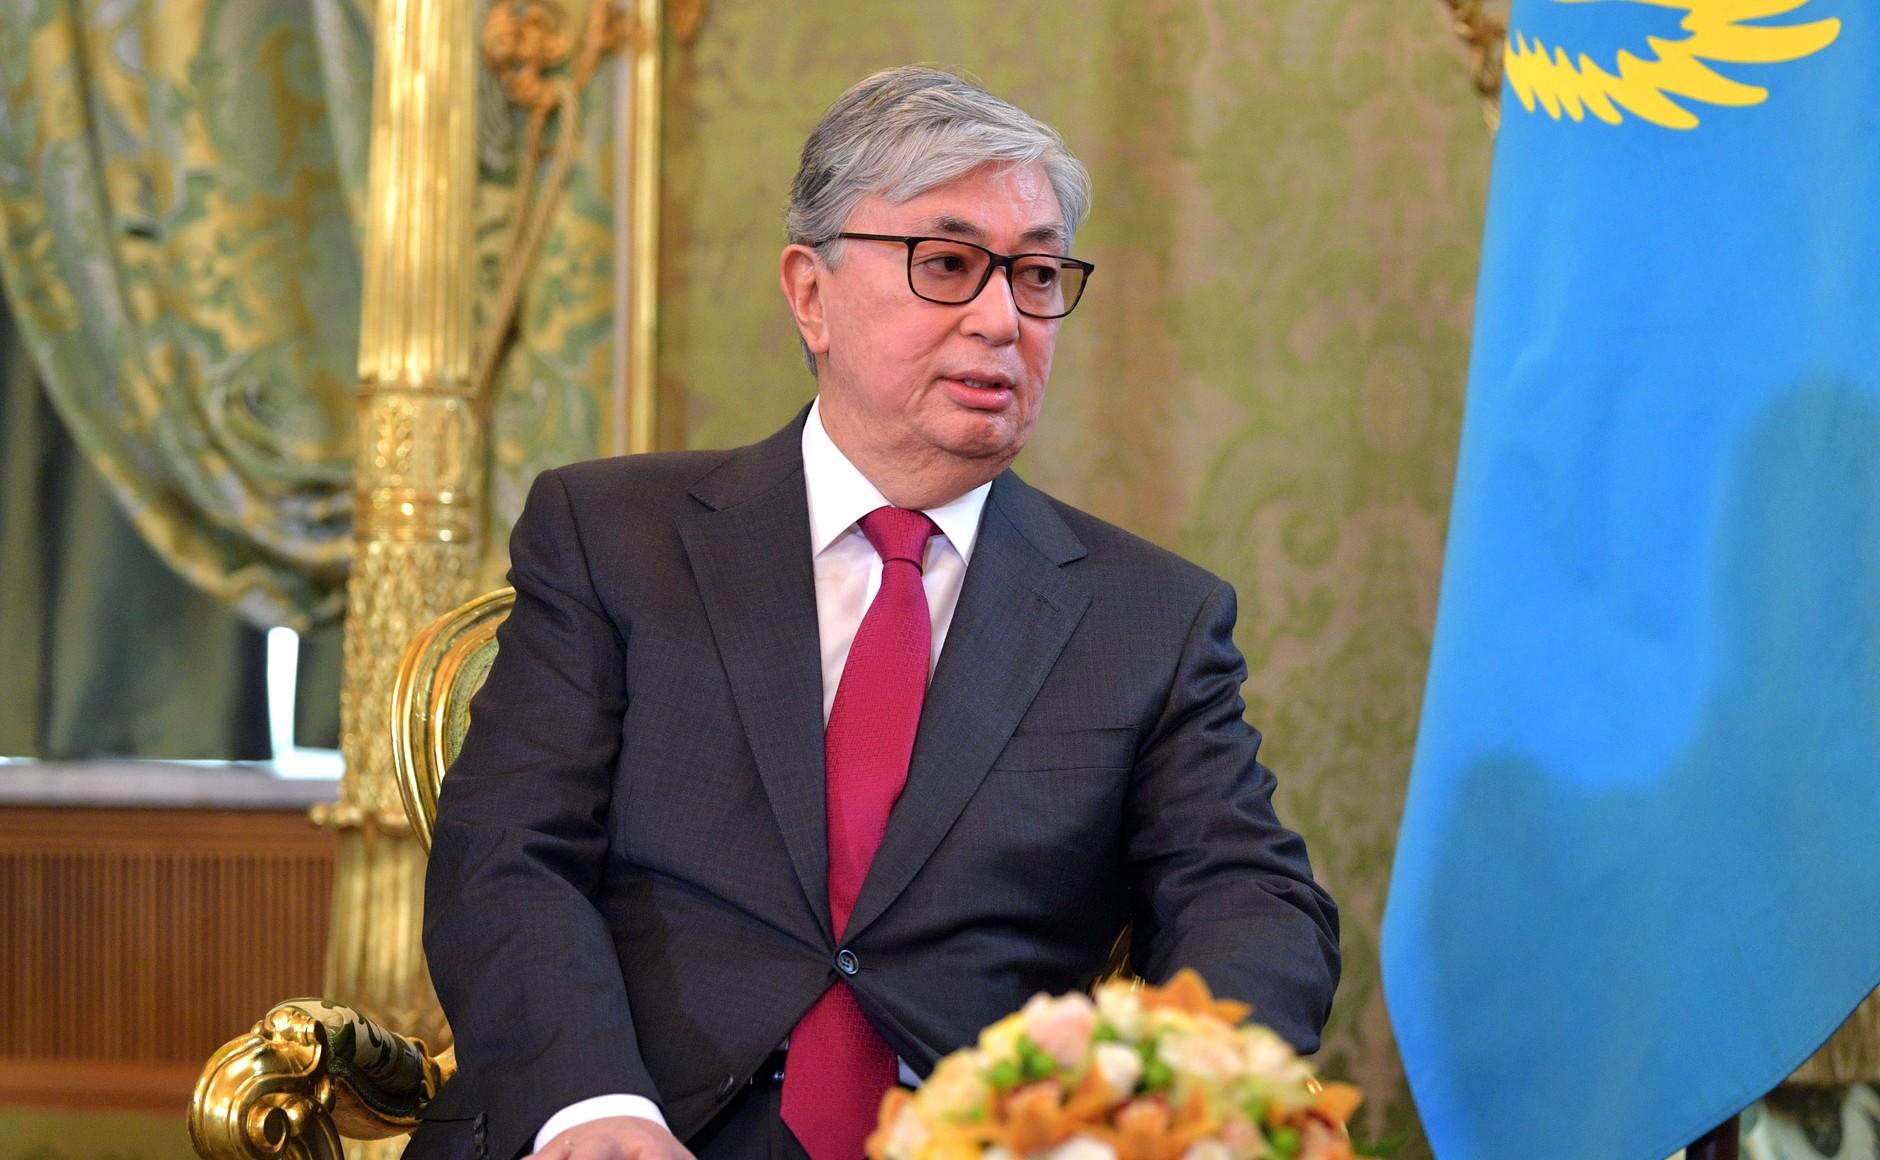 Tokaïev Président Kazakhstan Suffrages